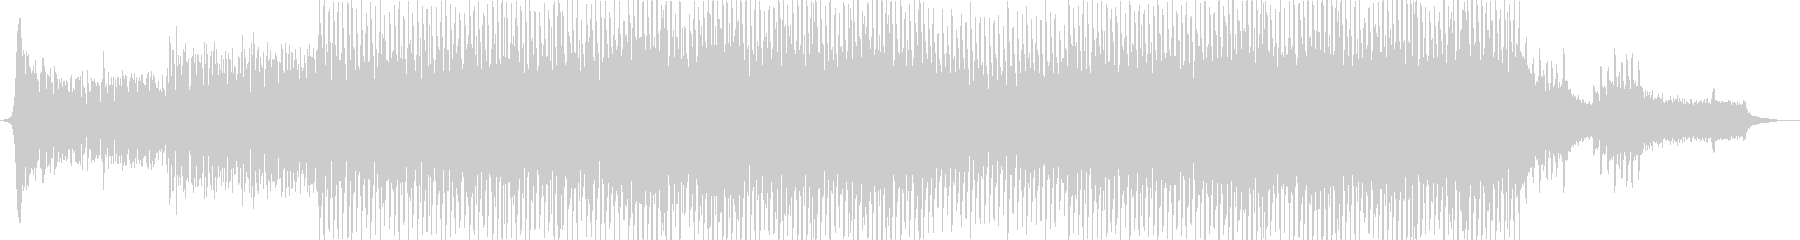 EDM、明るい躍動感、ピアノメロ-05の未再生の波形